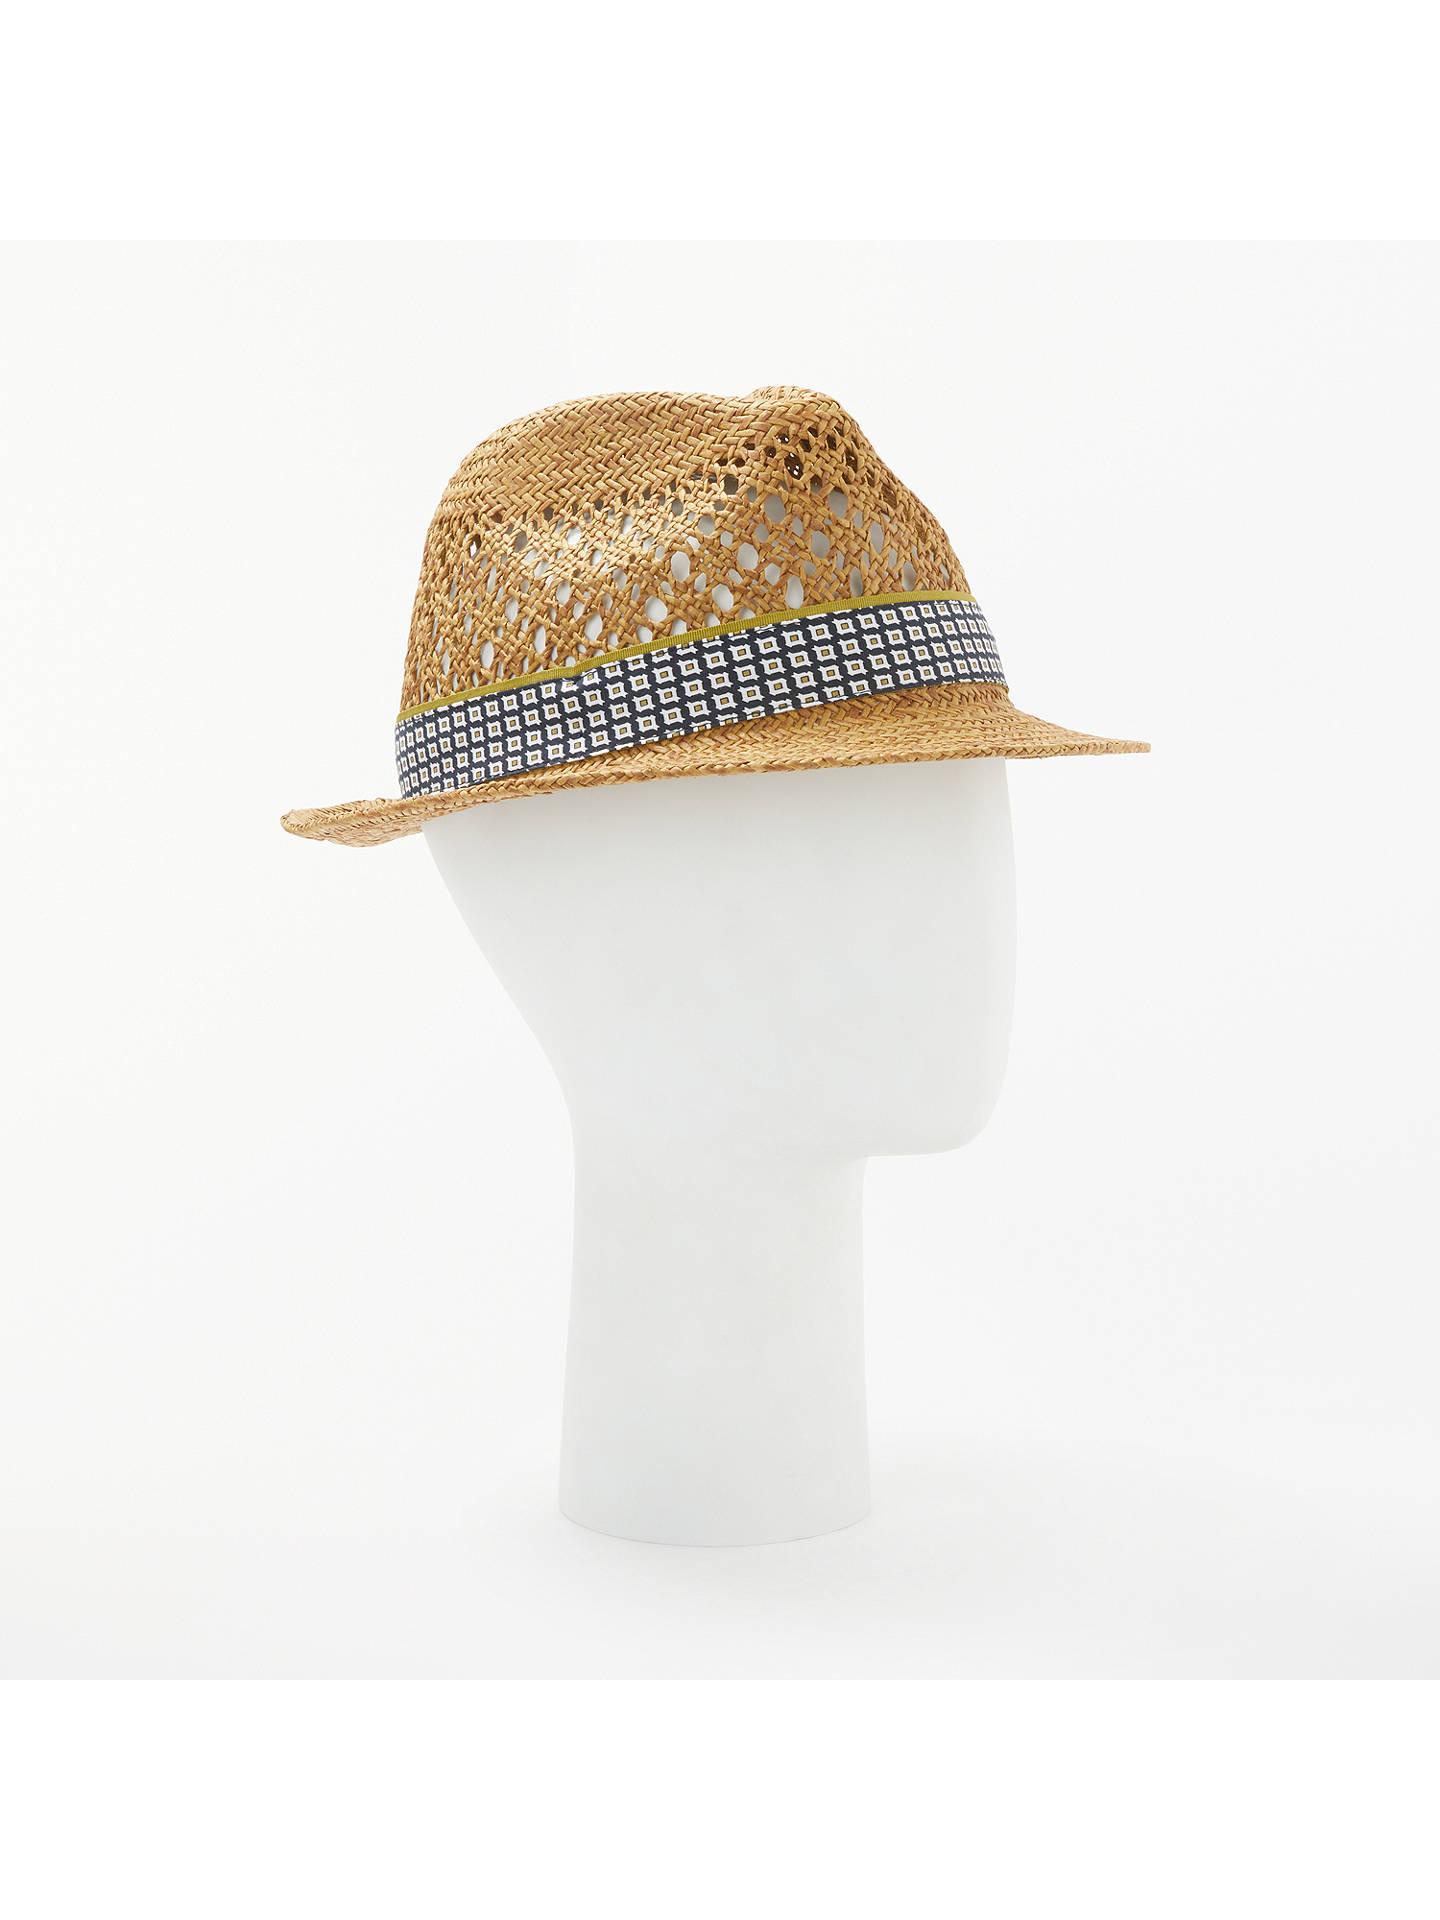 5e7bd3ba75f6d9 Buy Ted Baker Harlow Straw Hat, Natural, S/M Online at johnlewis.